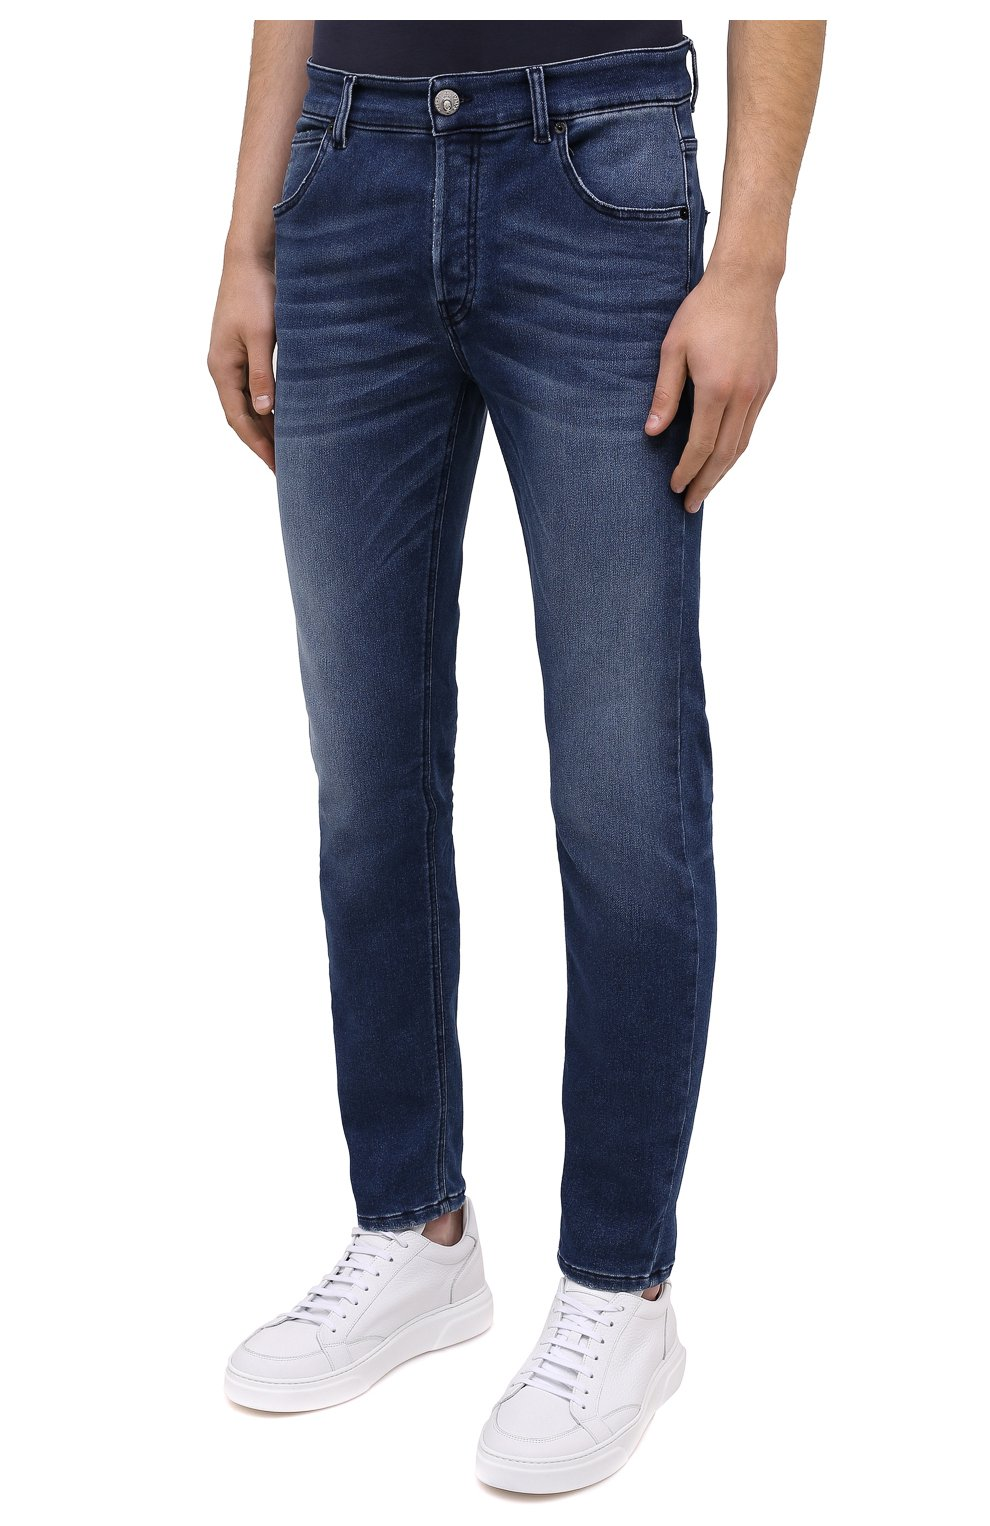 Мужские джинсы PREMIUM MOOD DENIM SUPERIOR темно-синего цвета, арт. F21 310337343/PAUL | Фото 3